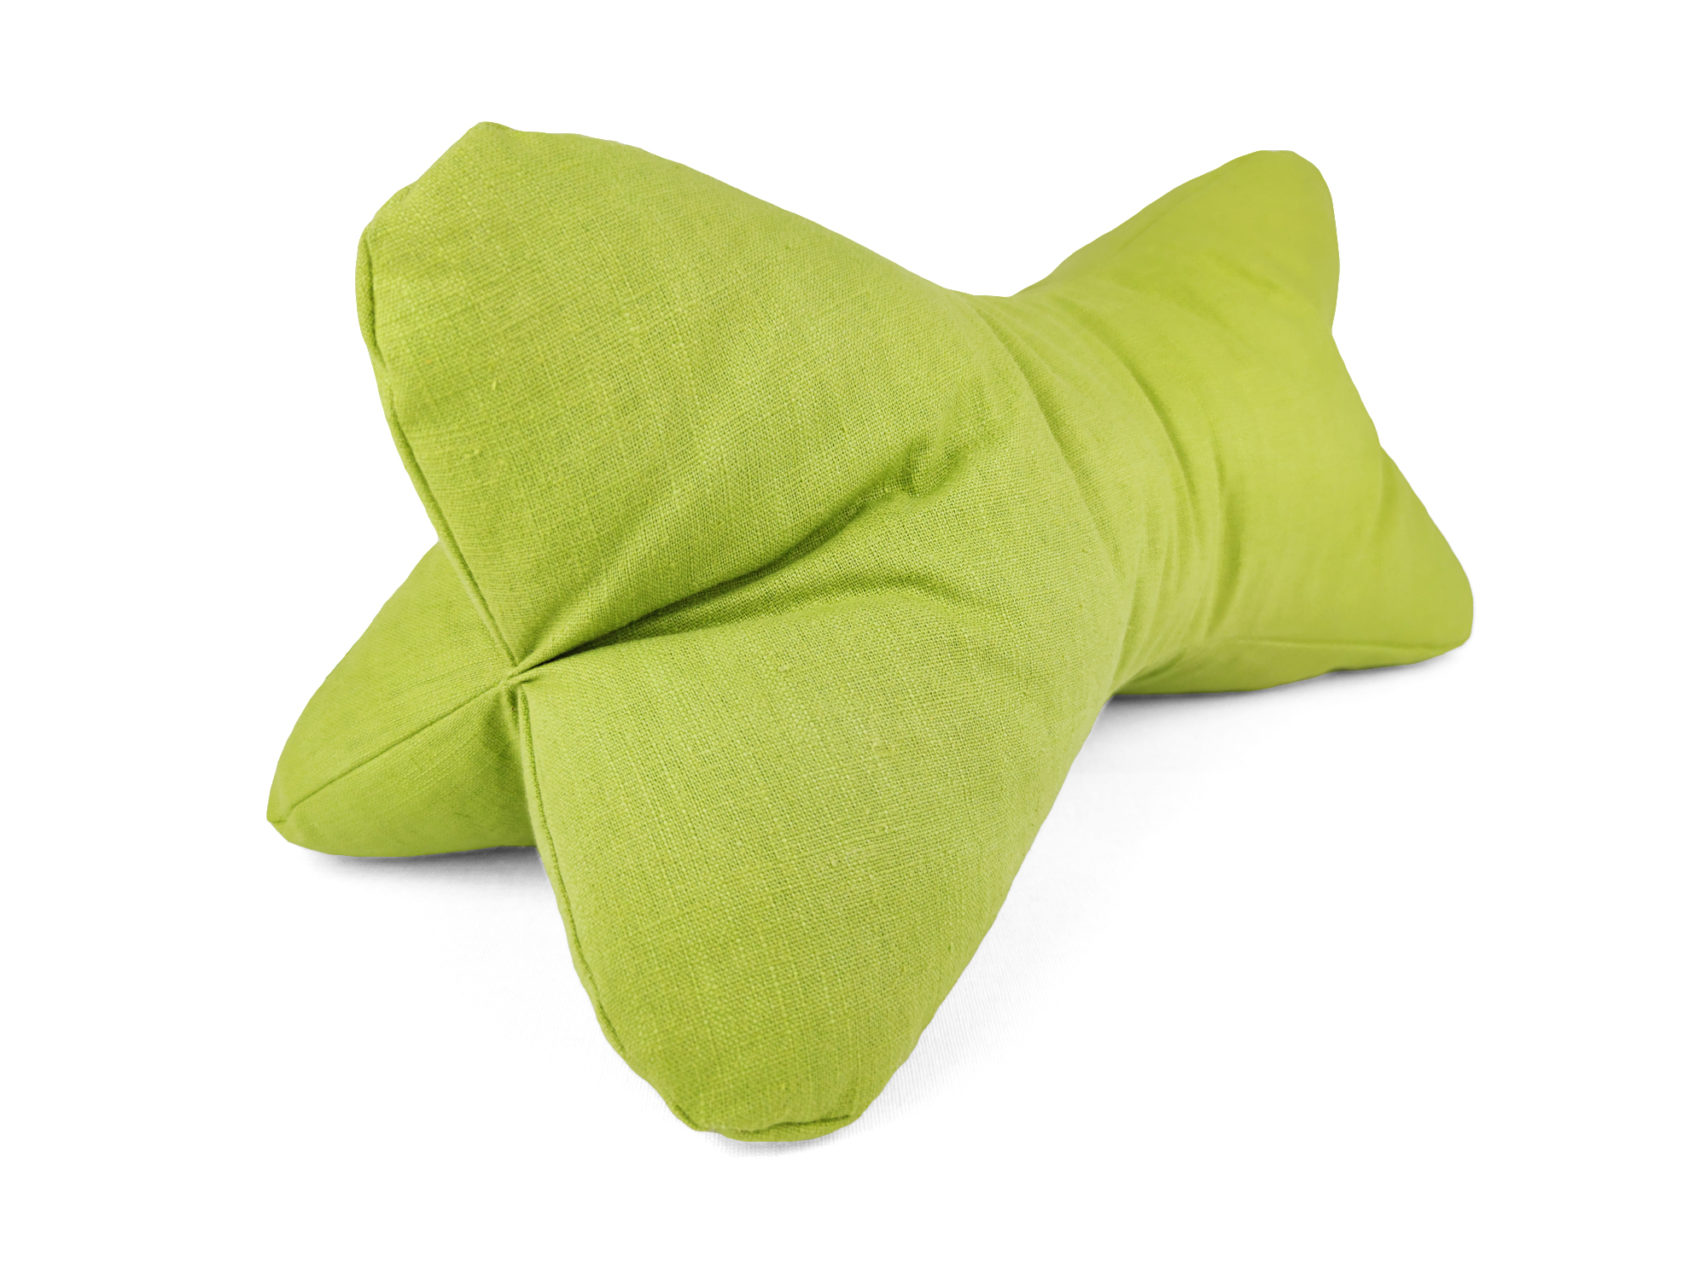 Leseknochen Ramie maigrün hellgrün